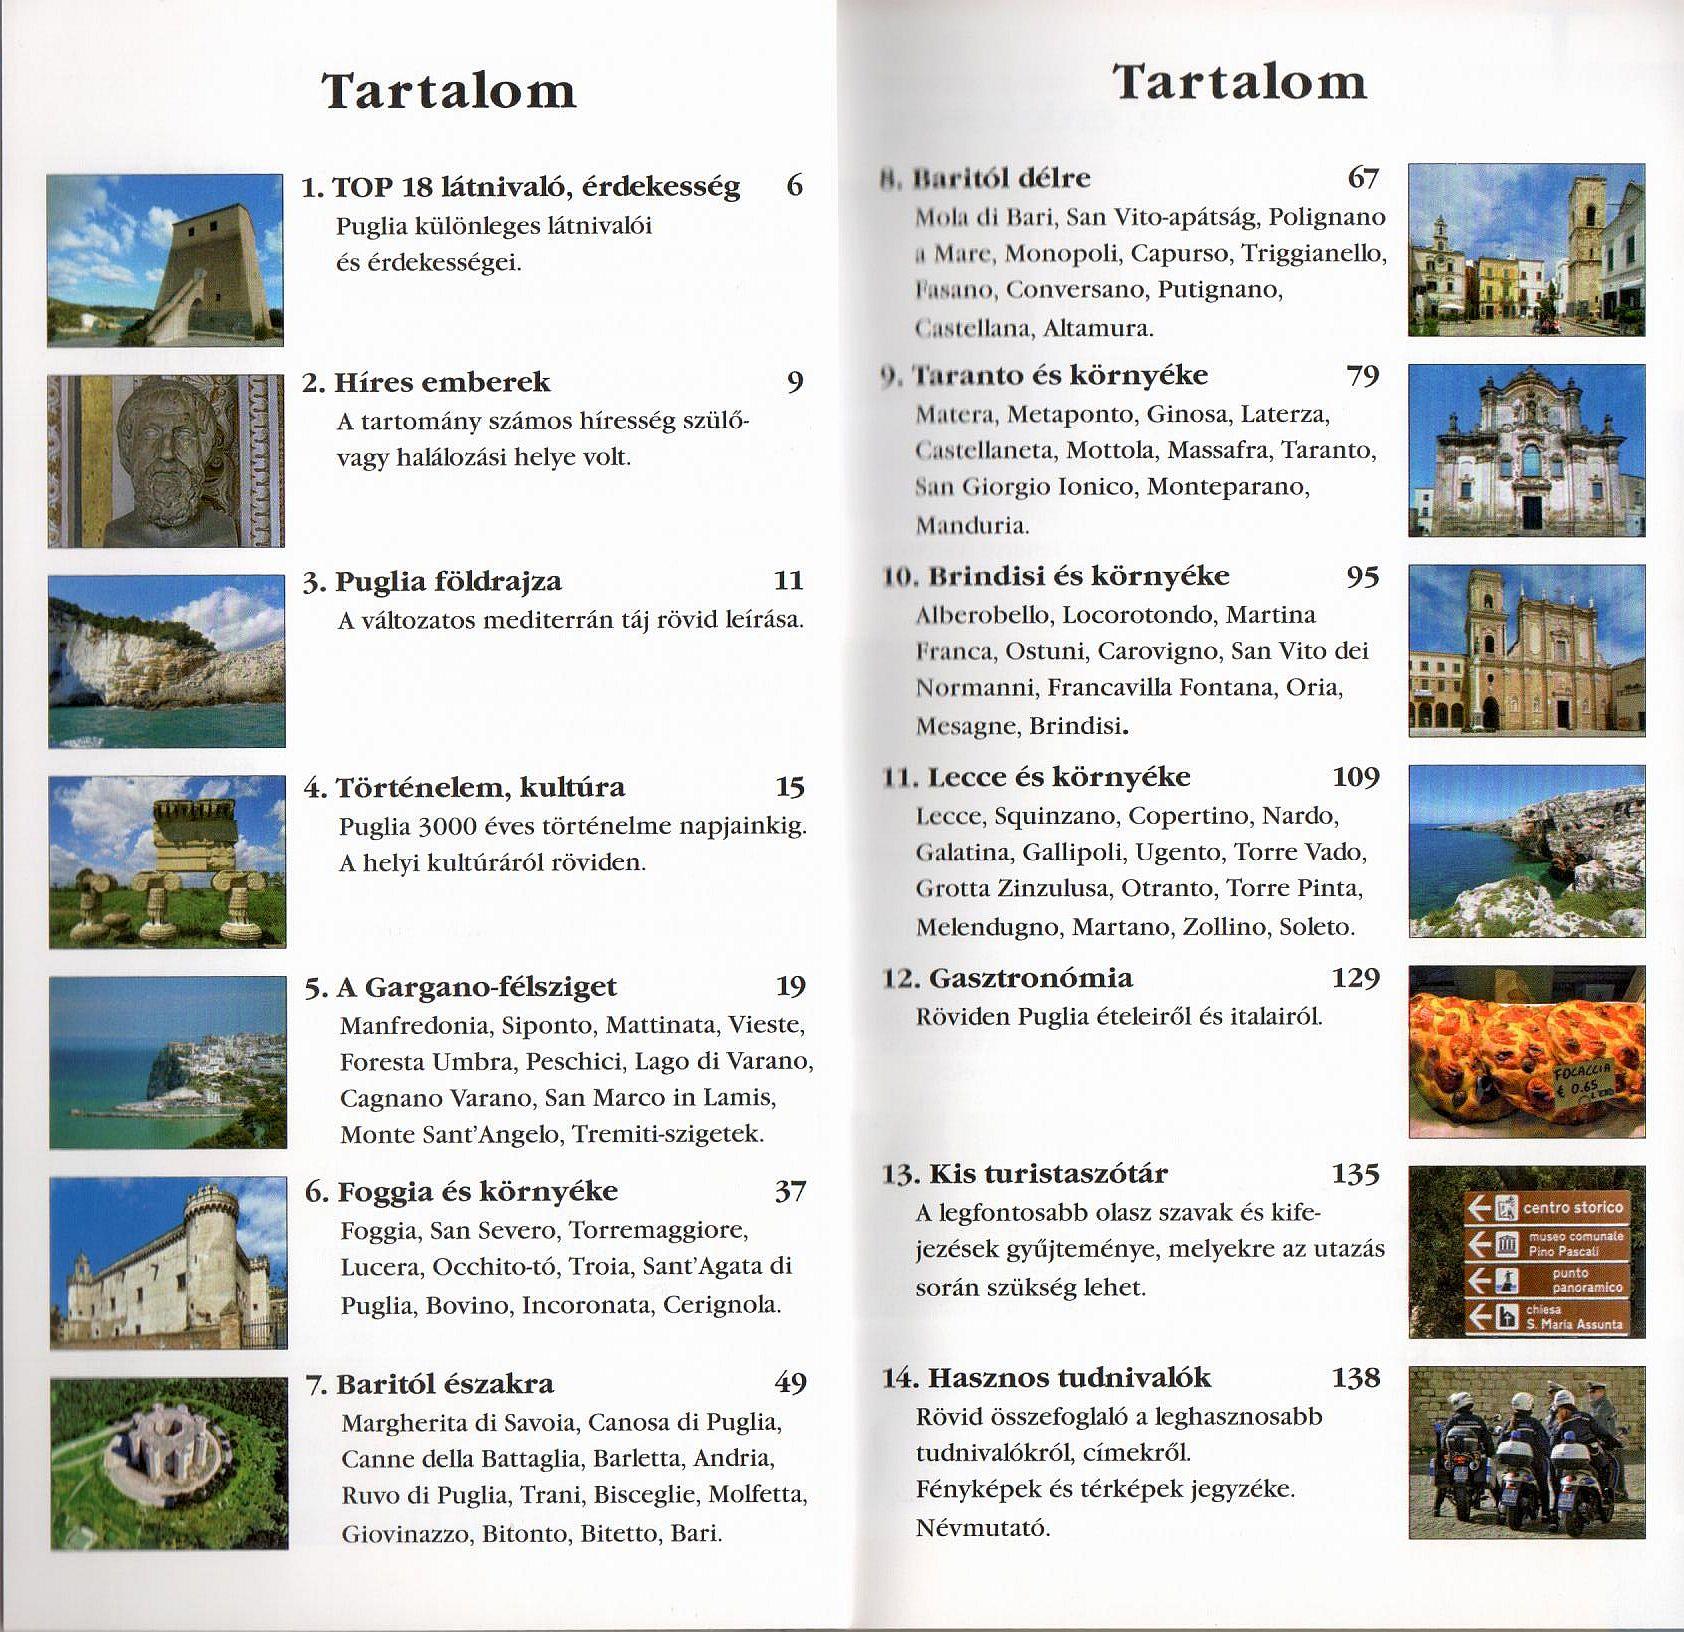 Puglia tartalomjegyzék